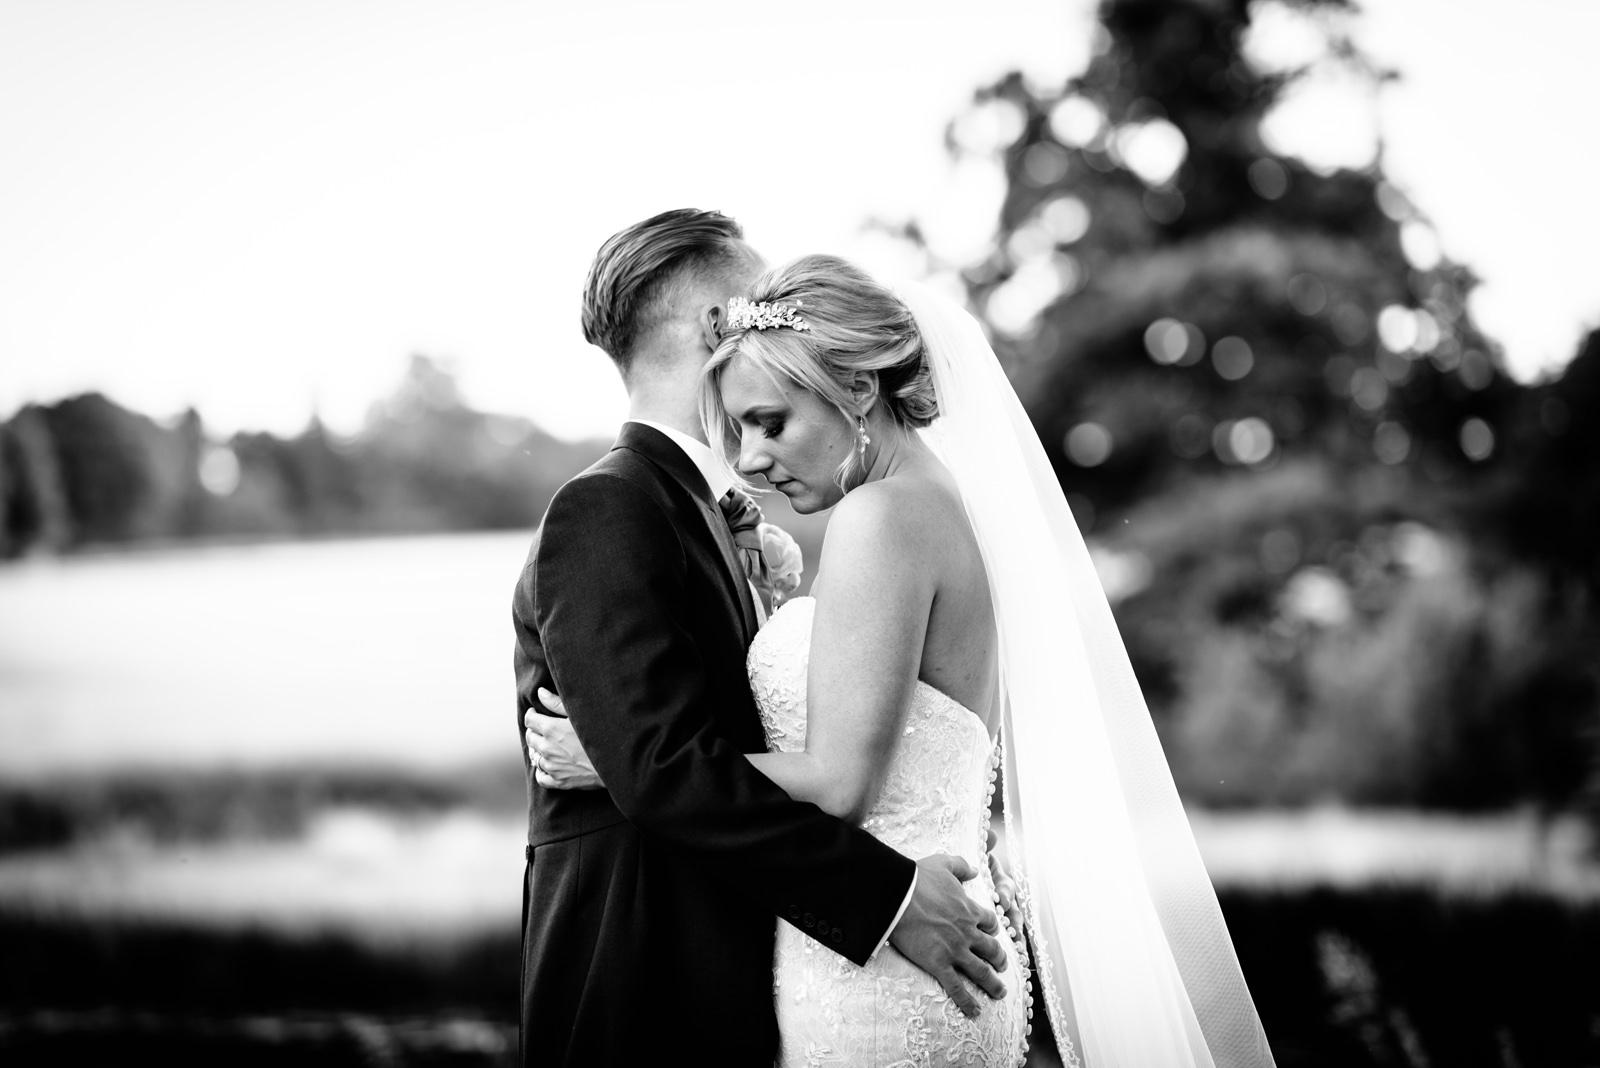 Rushton Hall wedding photographer